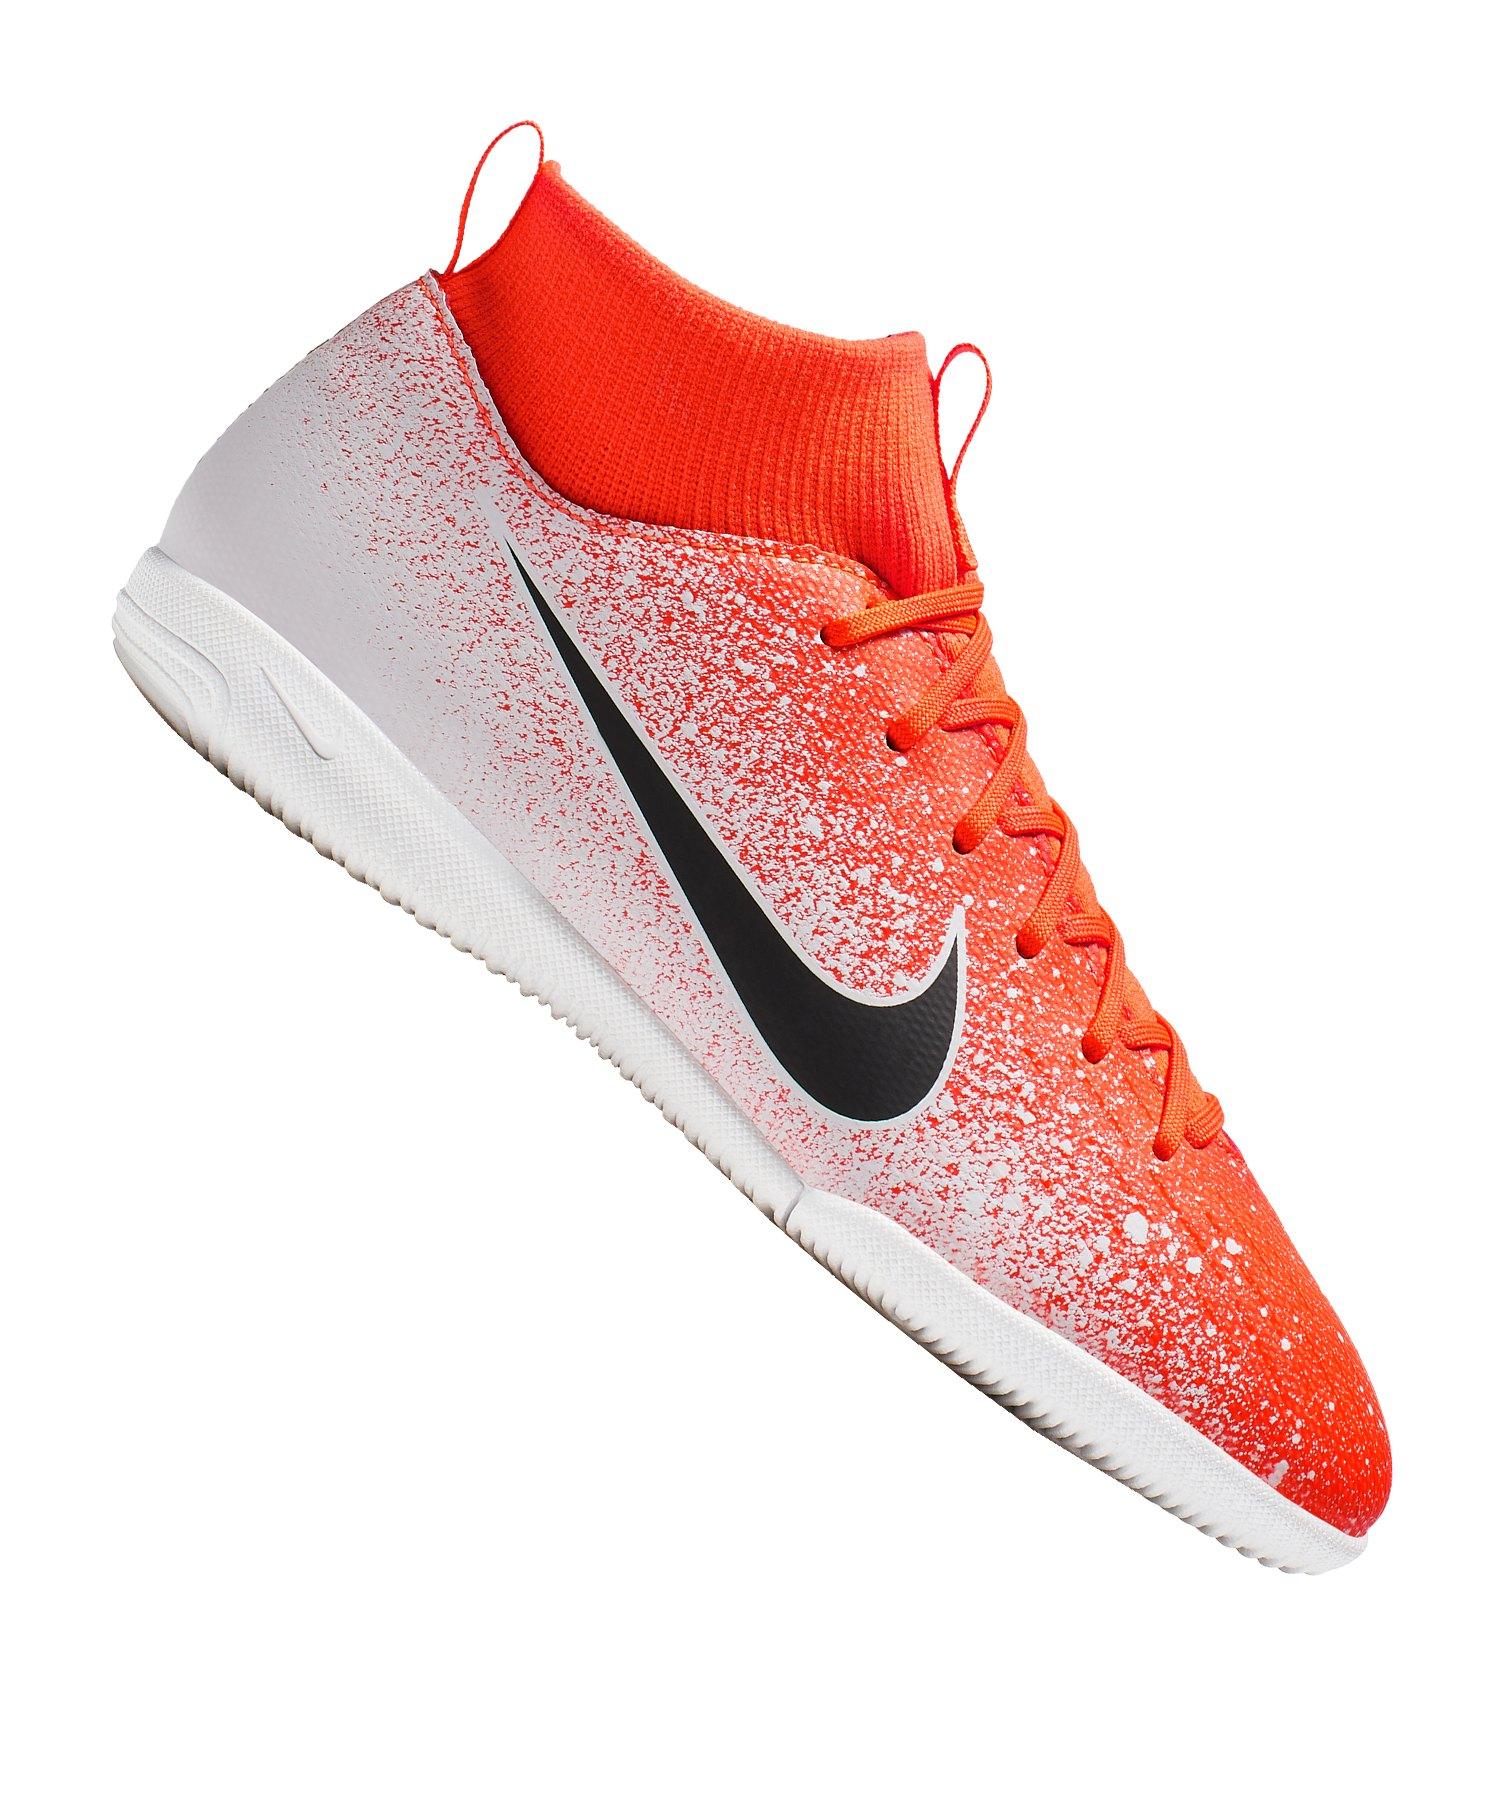 Nike Free 3.0 V2 Damen Laufschuhe Schwarz Rose Rot E35y4015